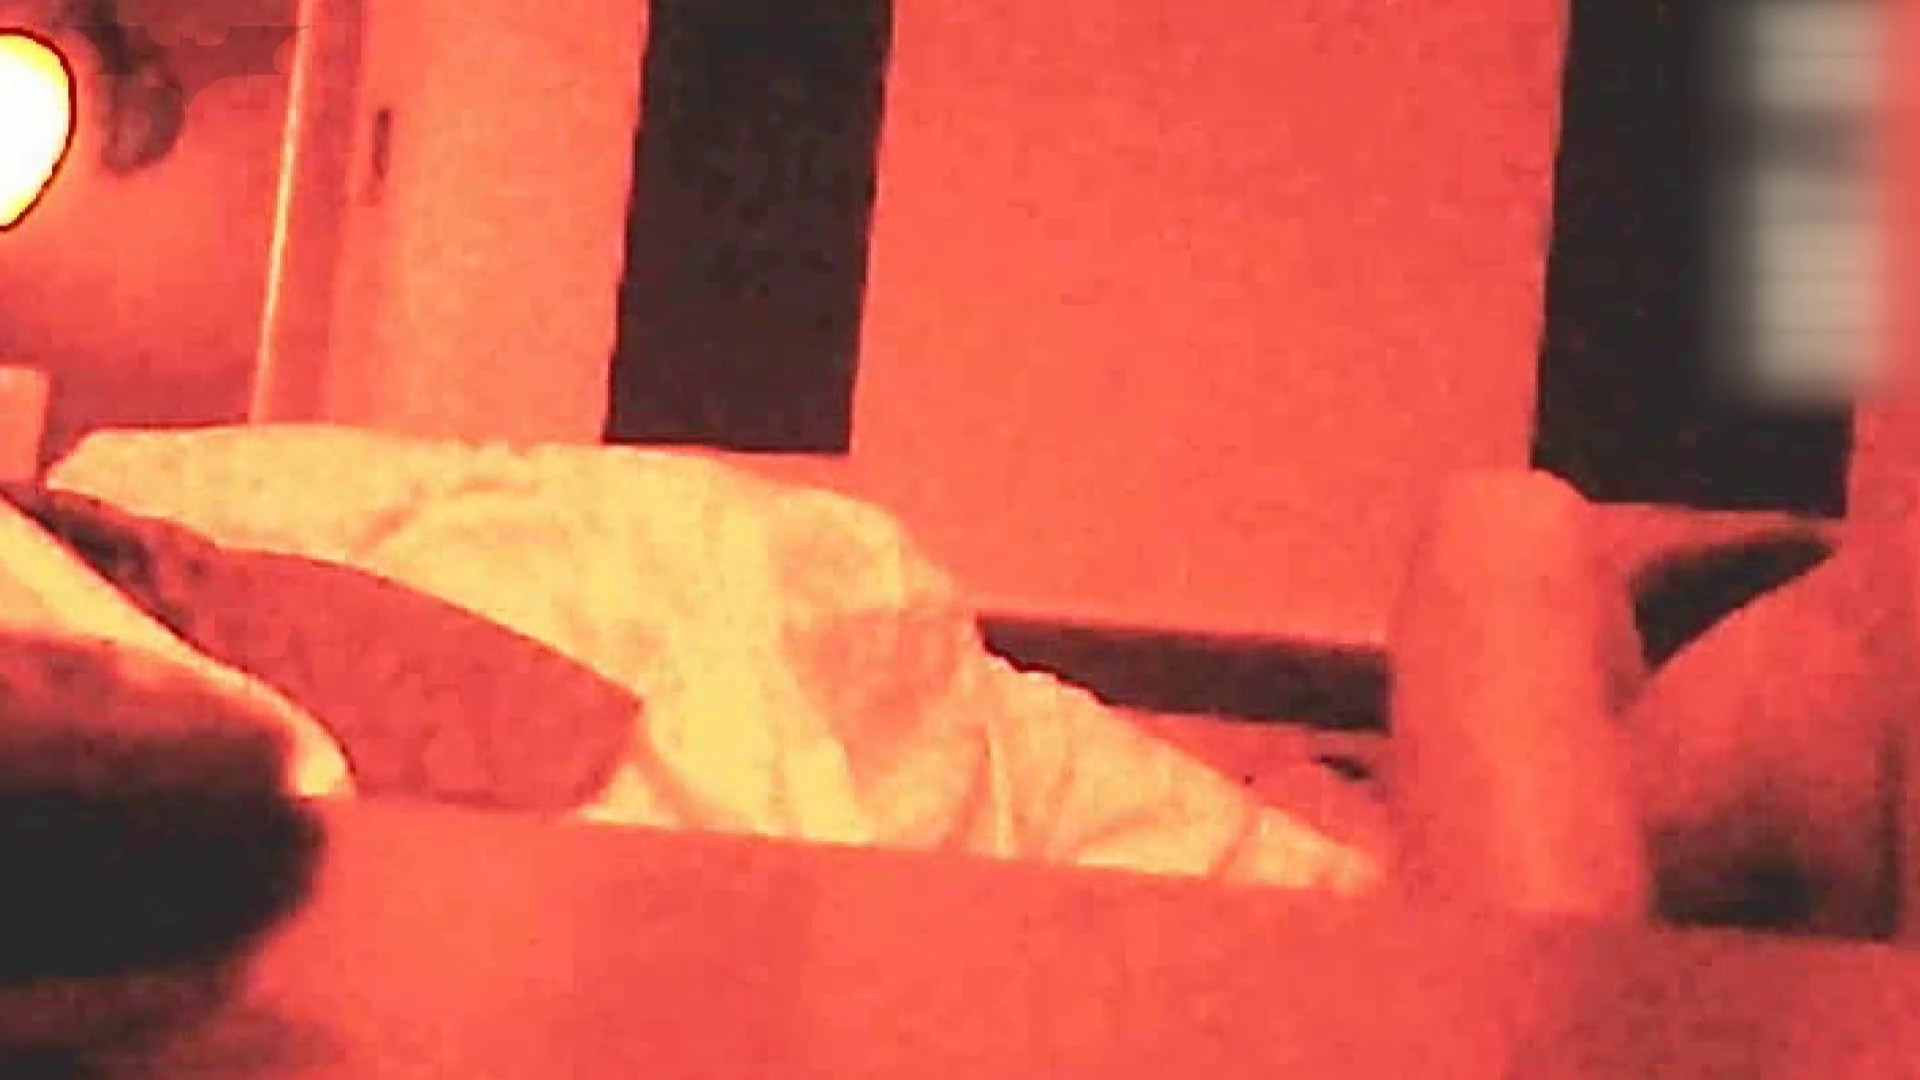 ▲2017_05位▲ 学園アイドル美人女子大生!❶4人厳選詰合せVol.49 人気作   女子大生  113画像 10